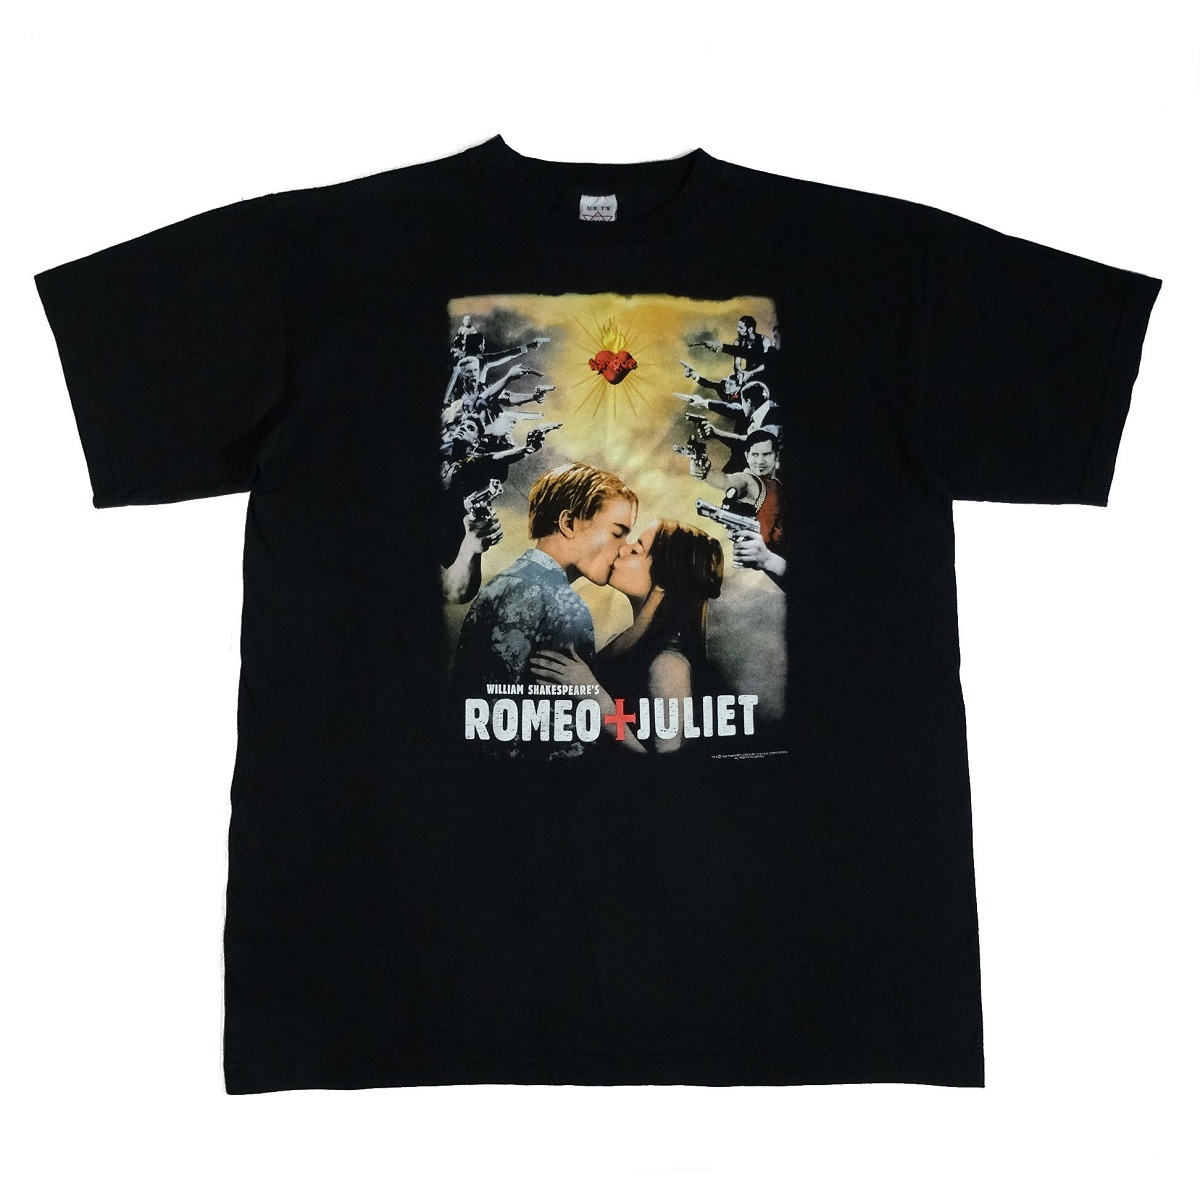 romeo juliet vintage 90s t shirt decaprio movie front image